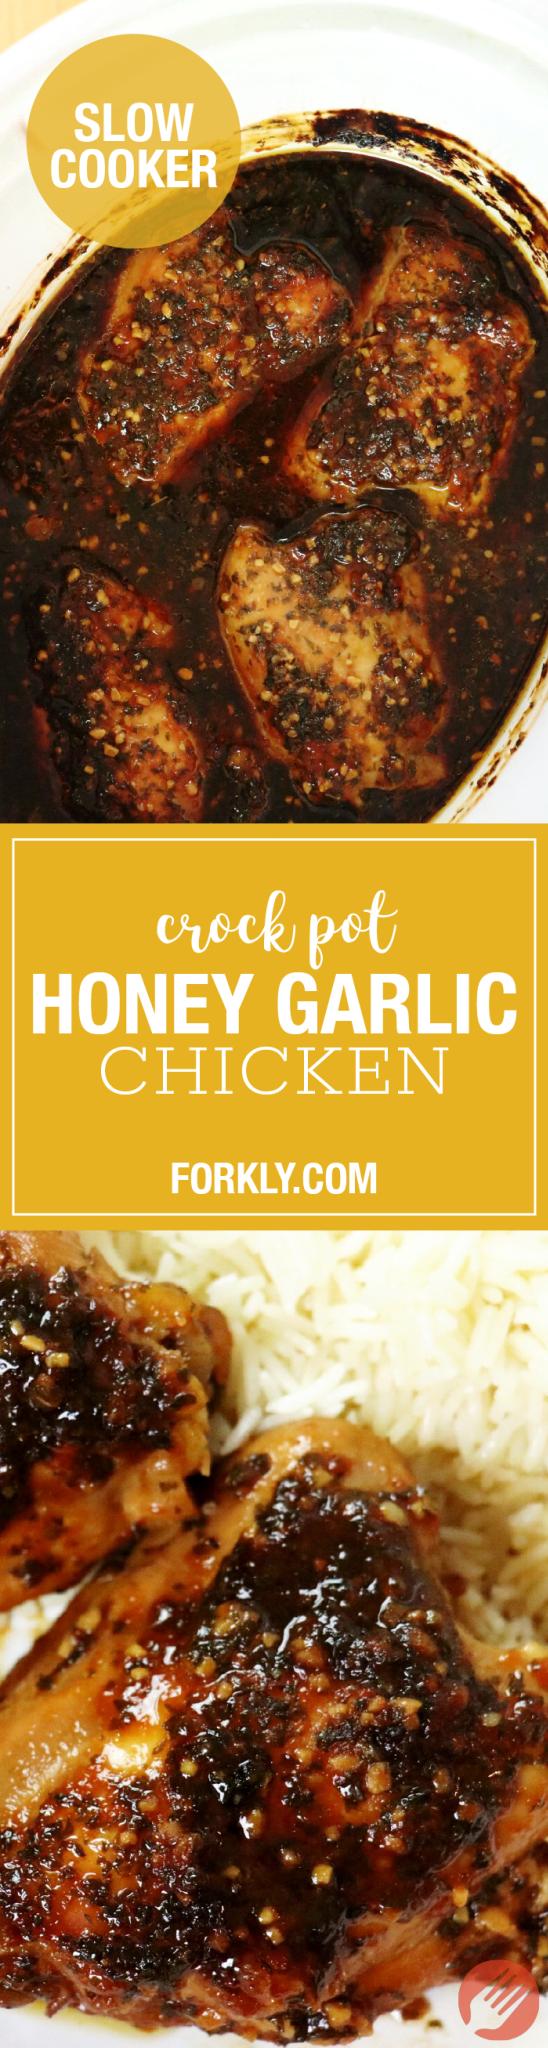 Crock Pot Honey Garlic Chicken - Forkly